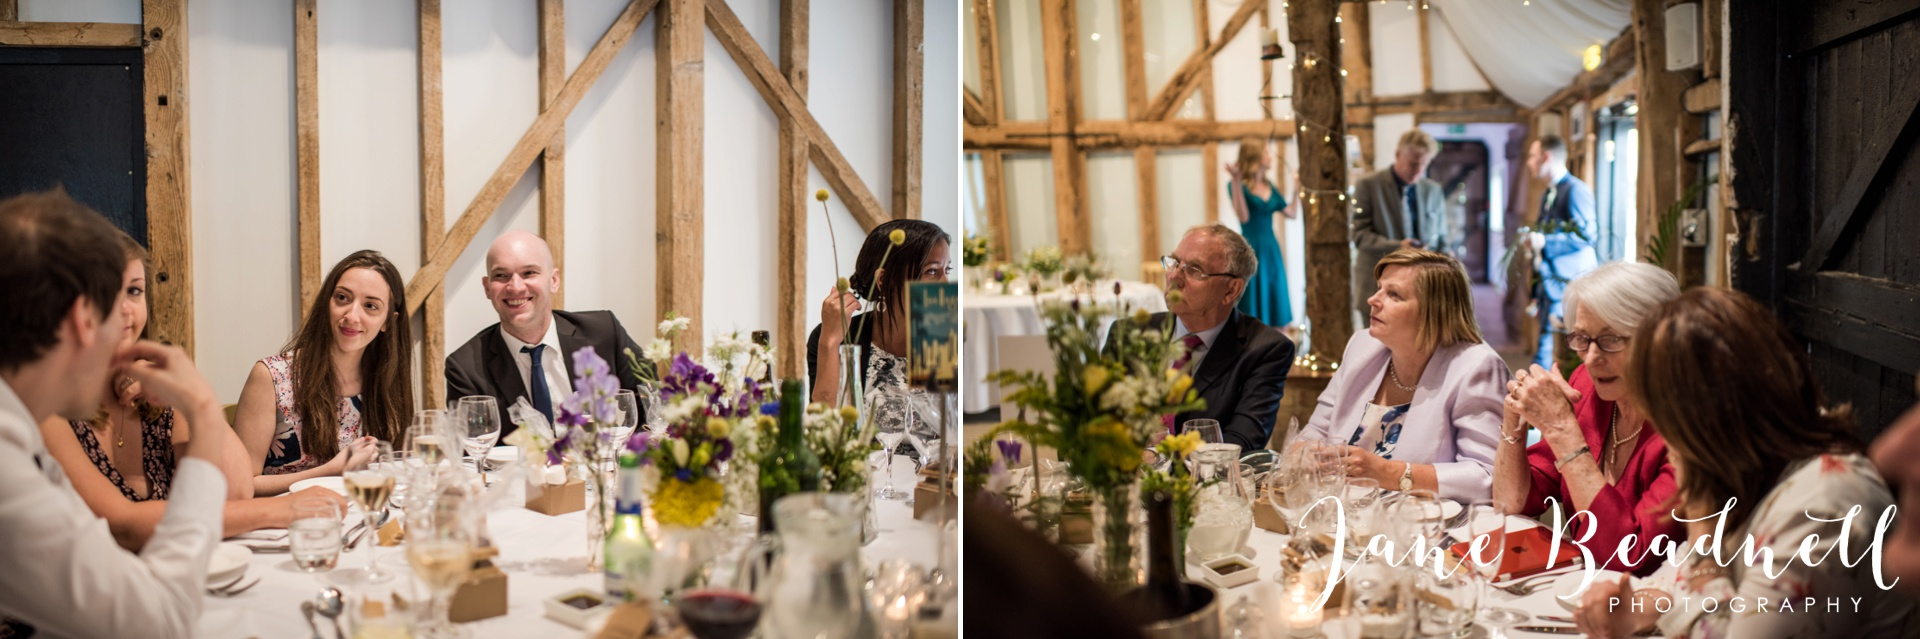 South Farm Wedding photography Hertfordshire by Jane Beadnell Photography fine art wedding photographer_0179